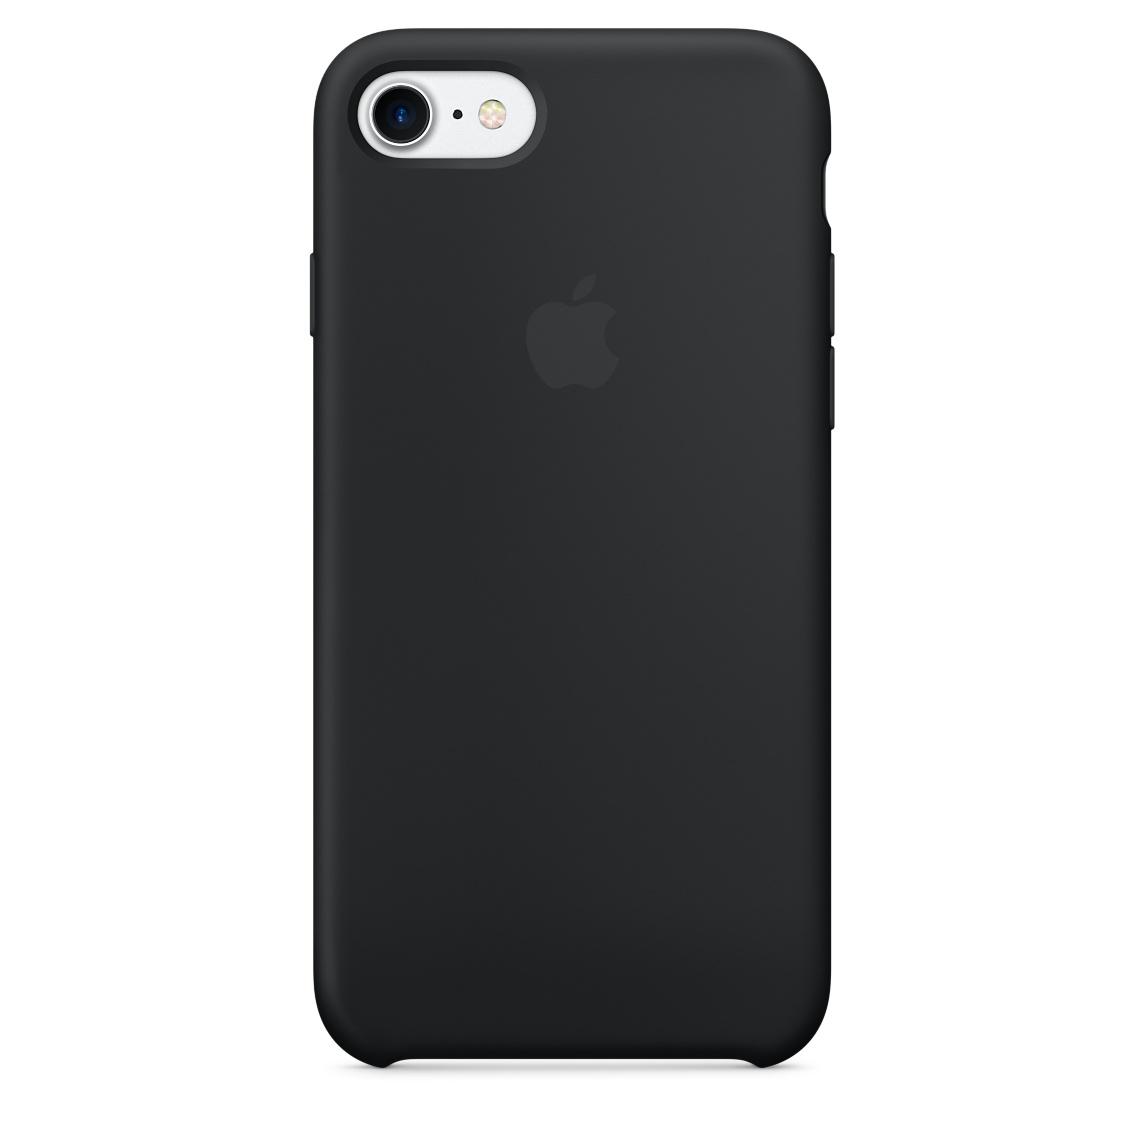 Pouzdro / kryt pro Apple iPhone 7 - Apple, Silicone Case Black mmw82zm/a